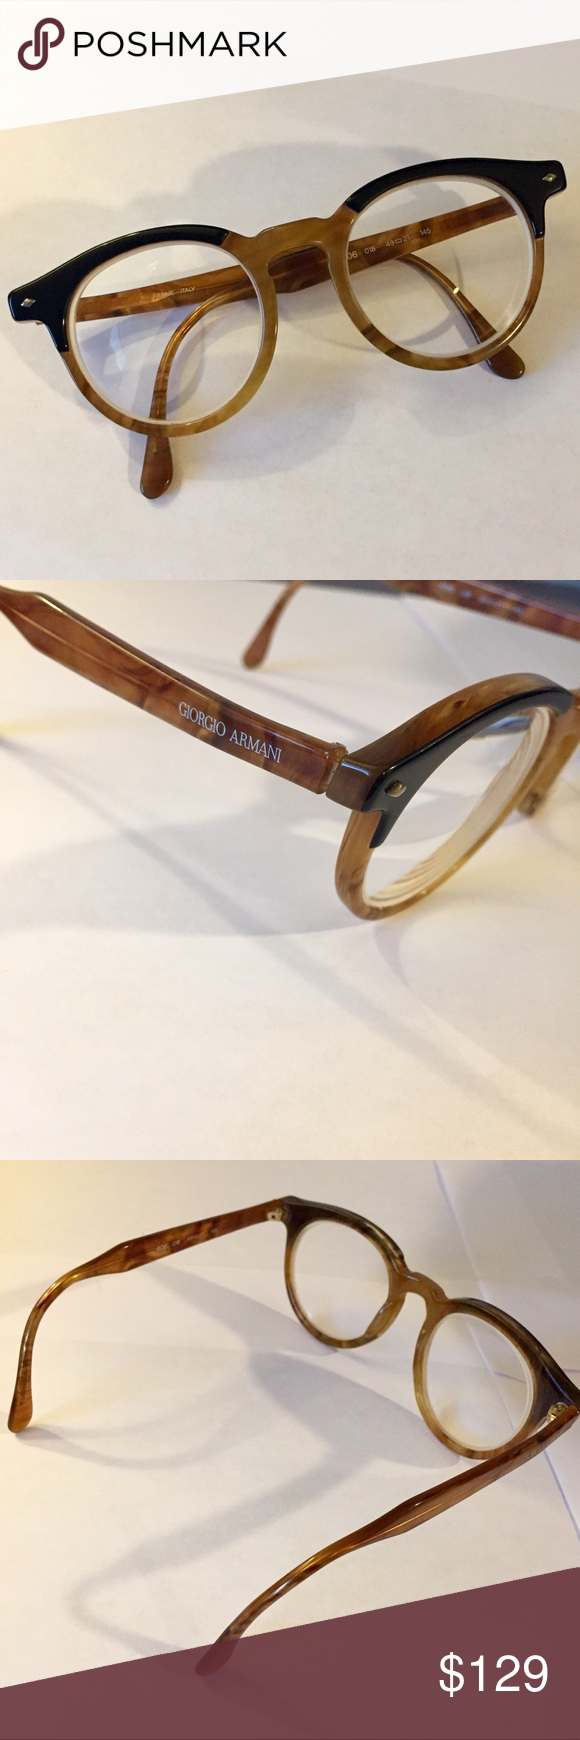 Huge Designer Sale! Giorgio Armani Eyewear Frames NWT | Pinterest ...